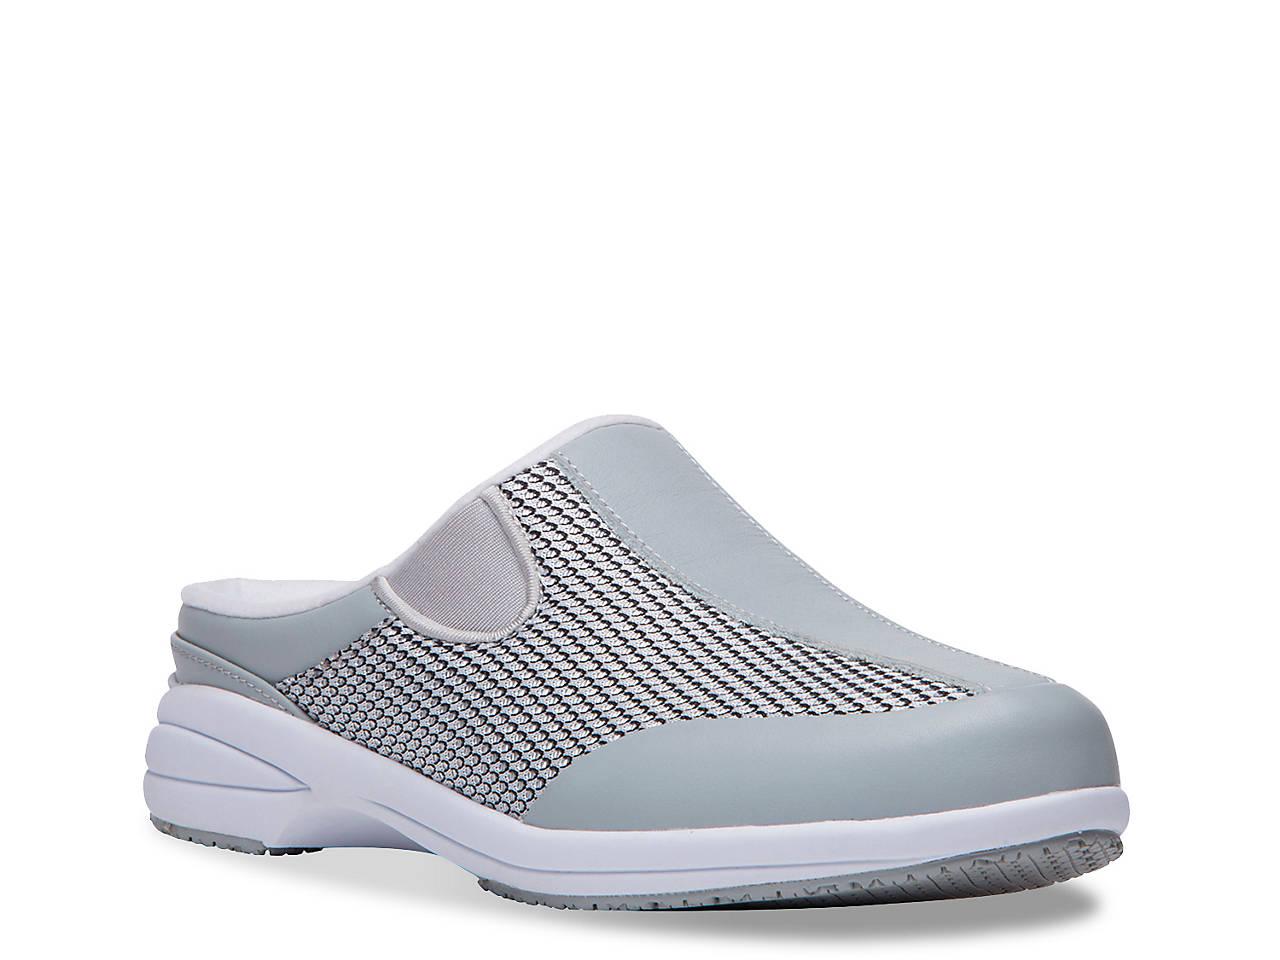 9cc55c11e72b Propet Washable Walker Work Slip-On Sneaker Women s Shoes